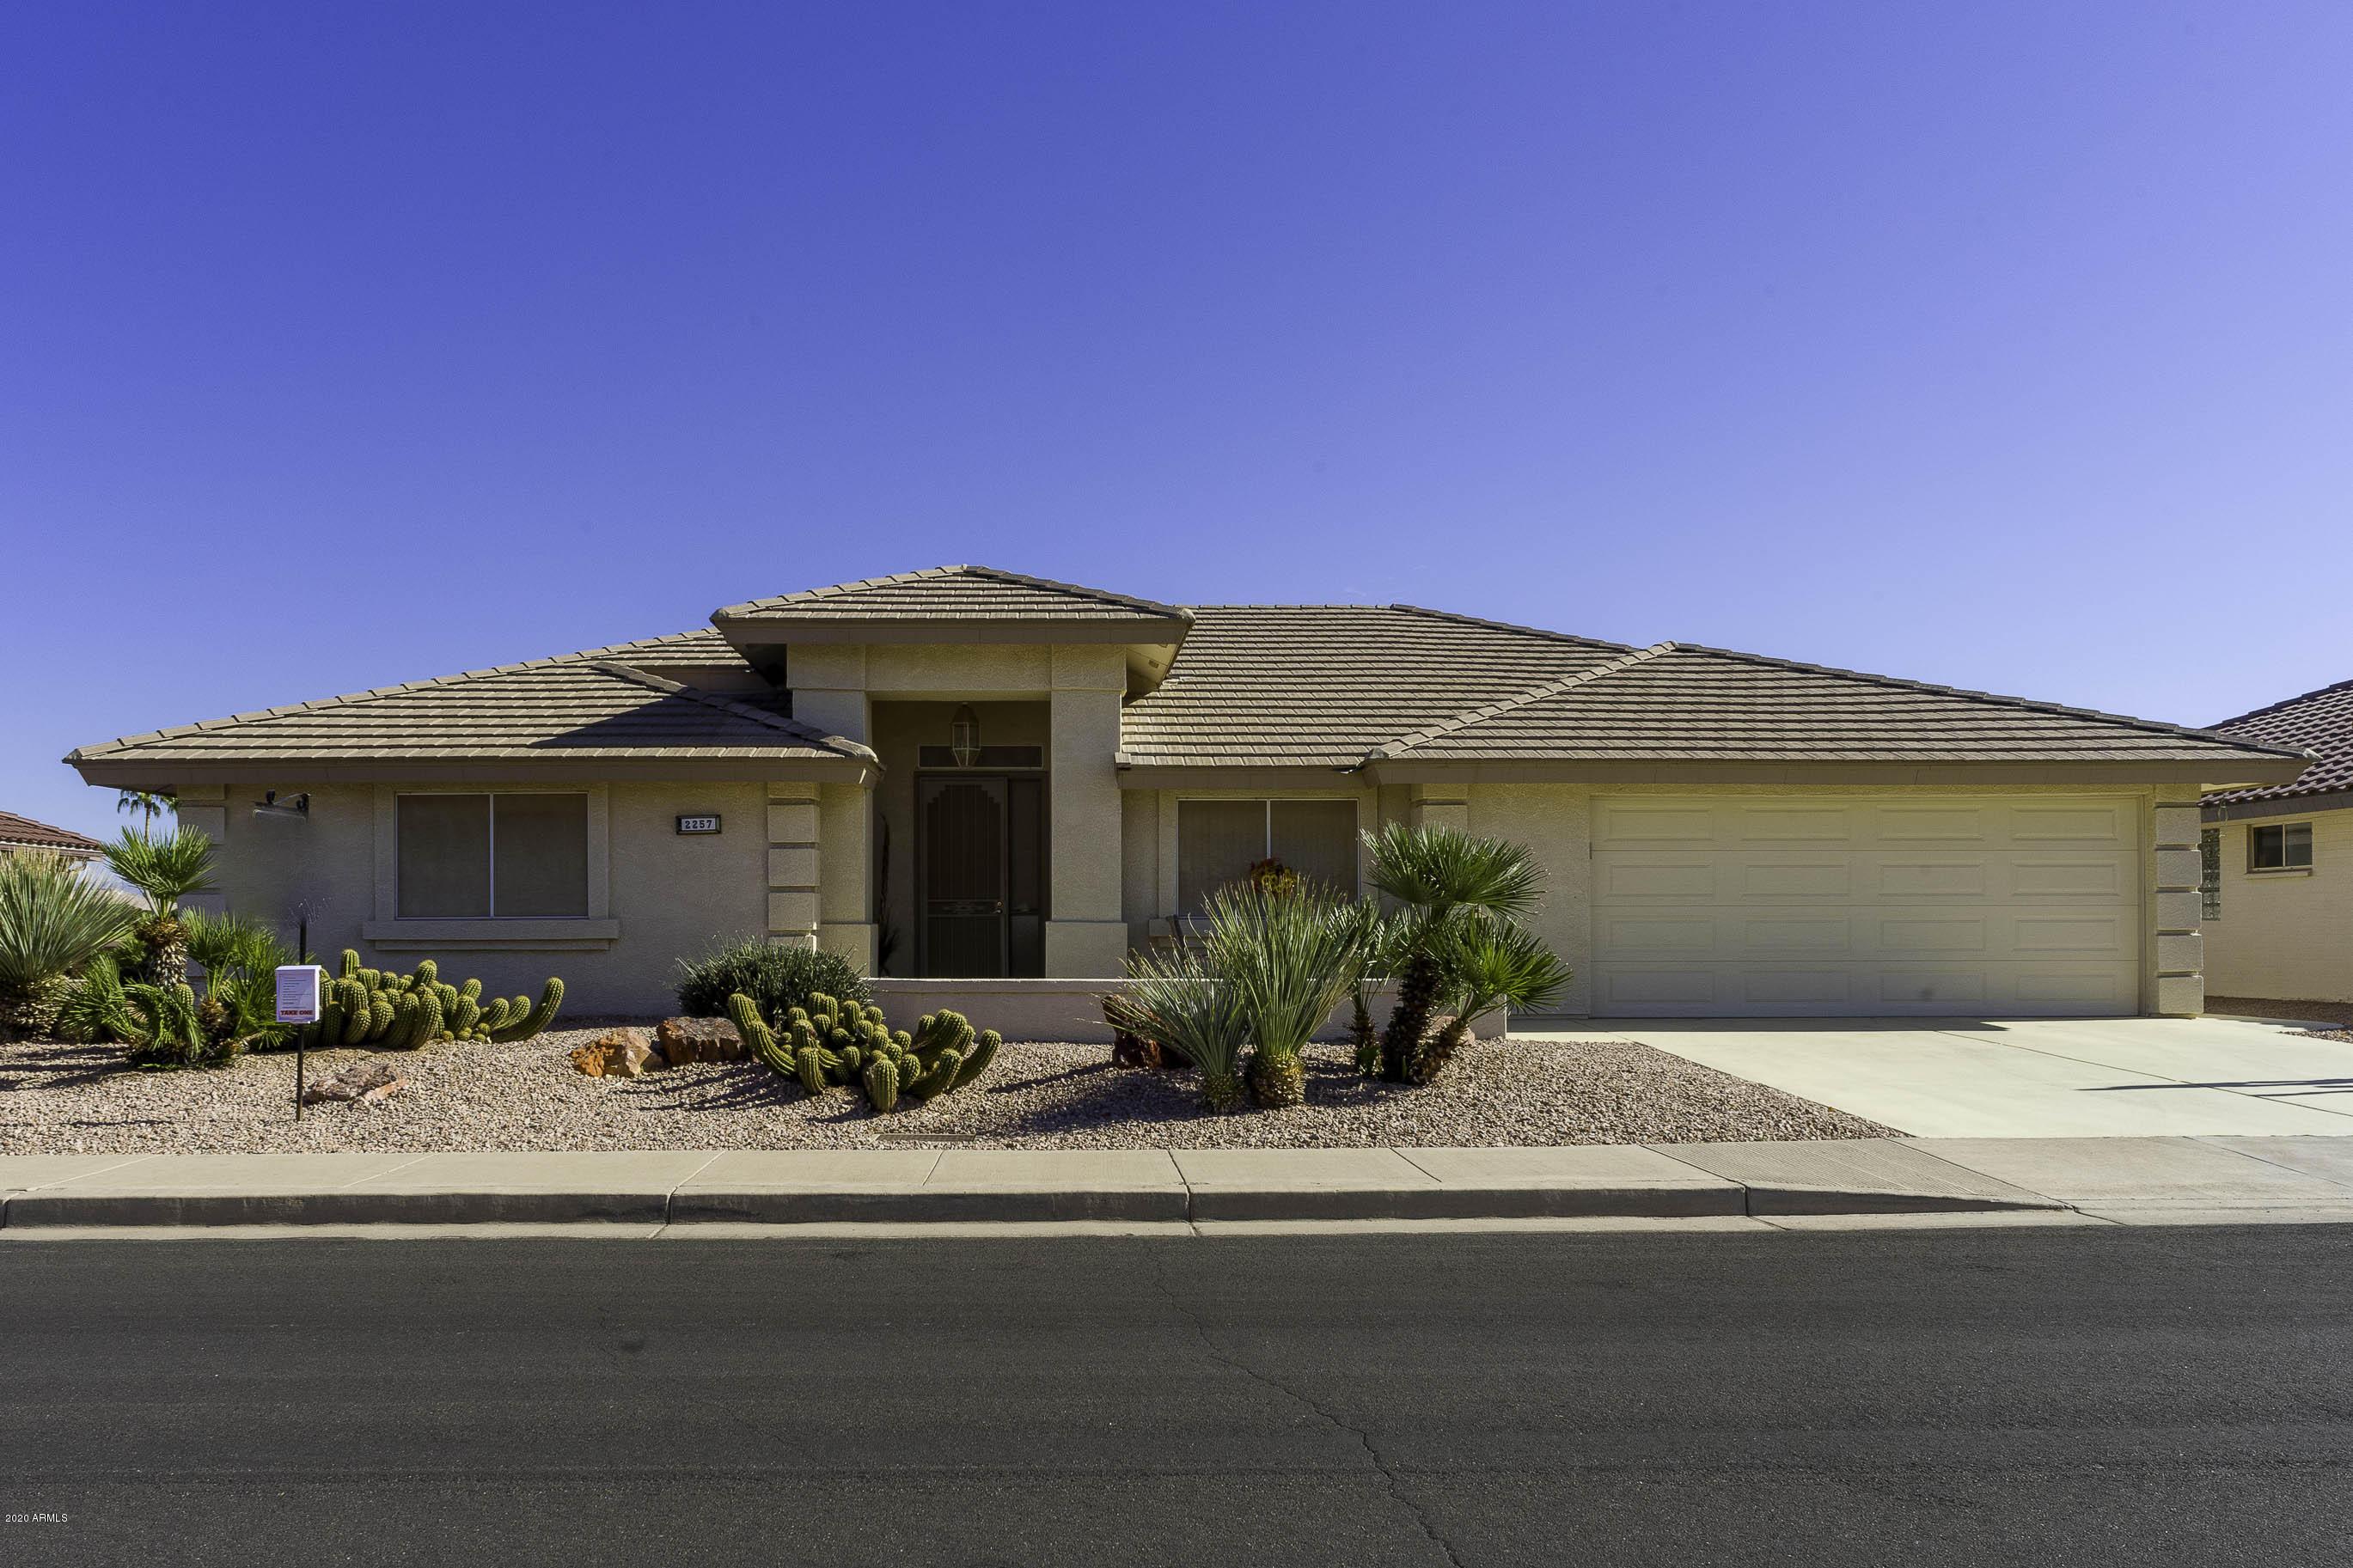 2257 S OLIVEWOOD --, Mesa, AZ 85209